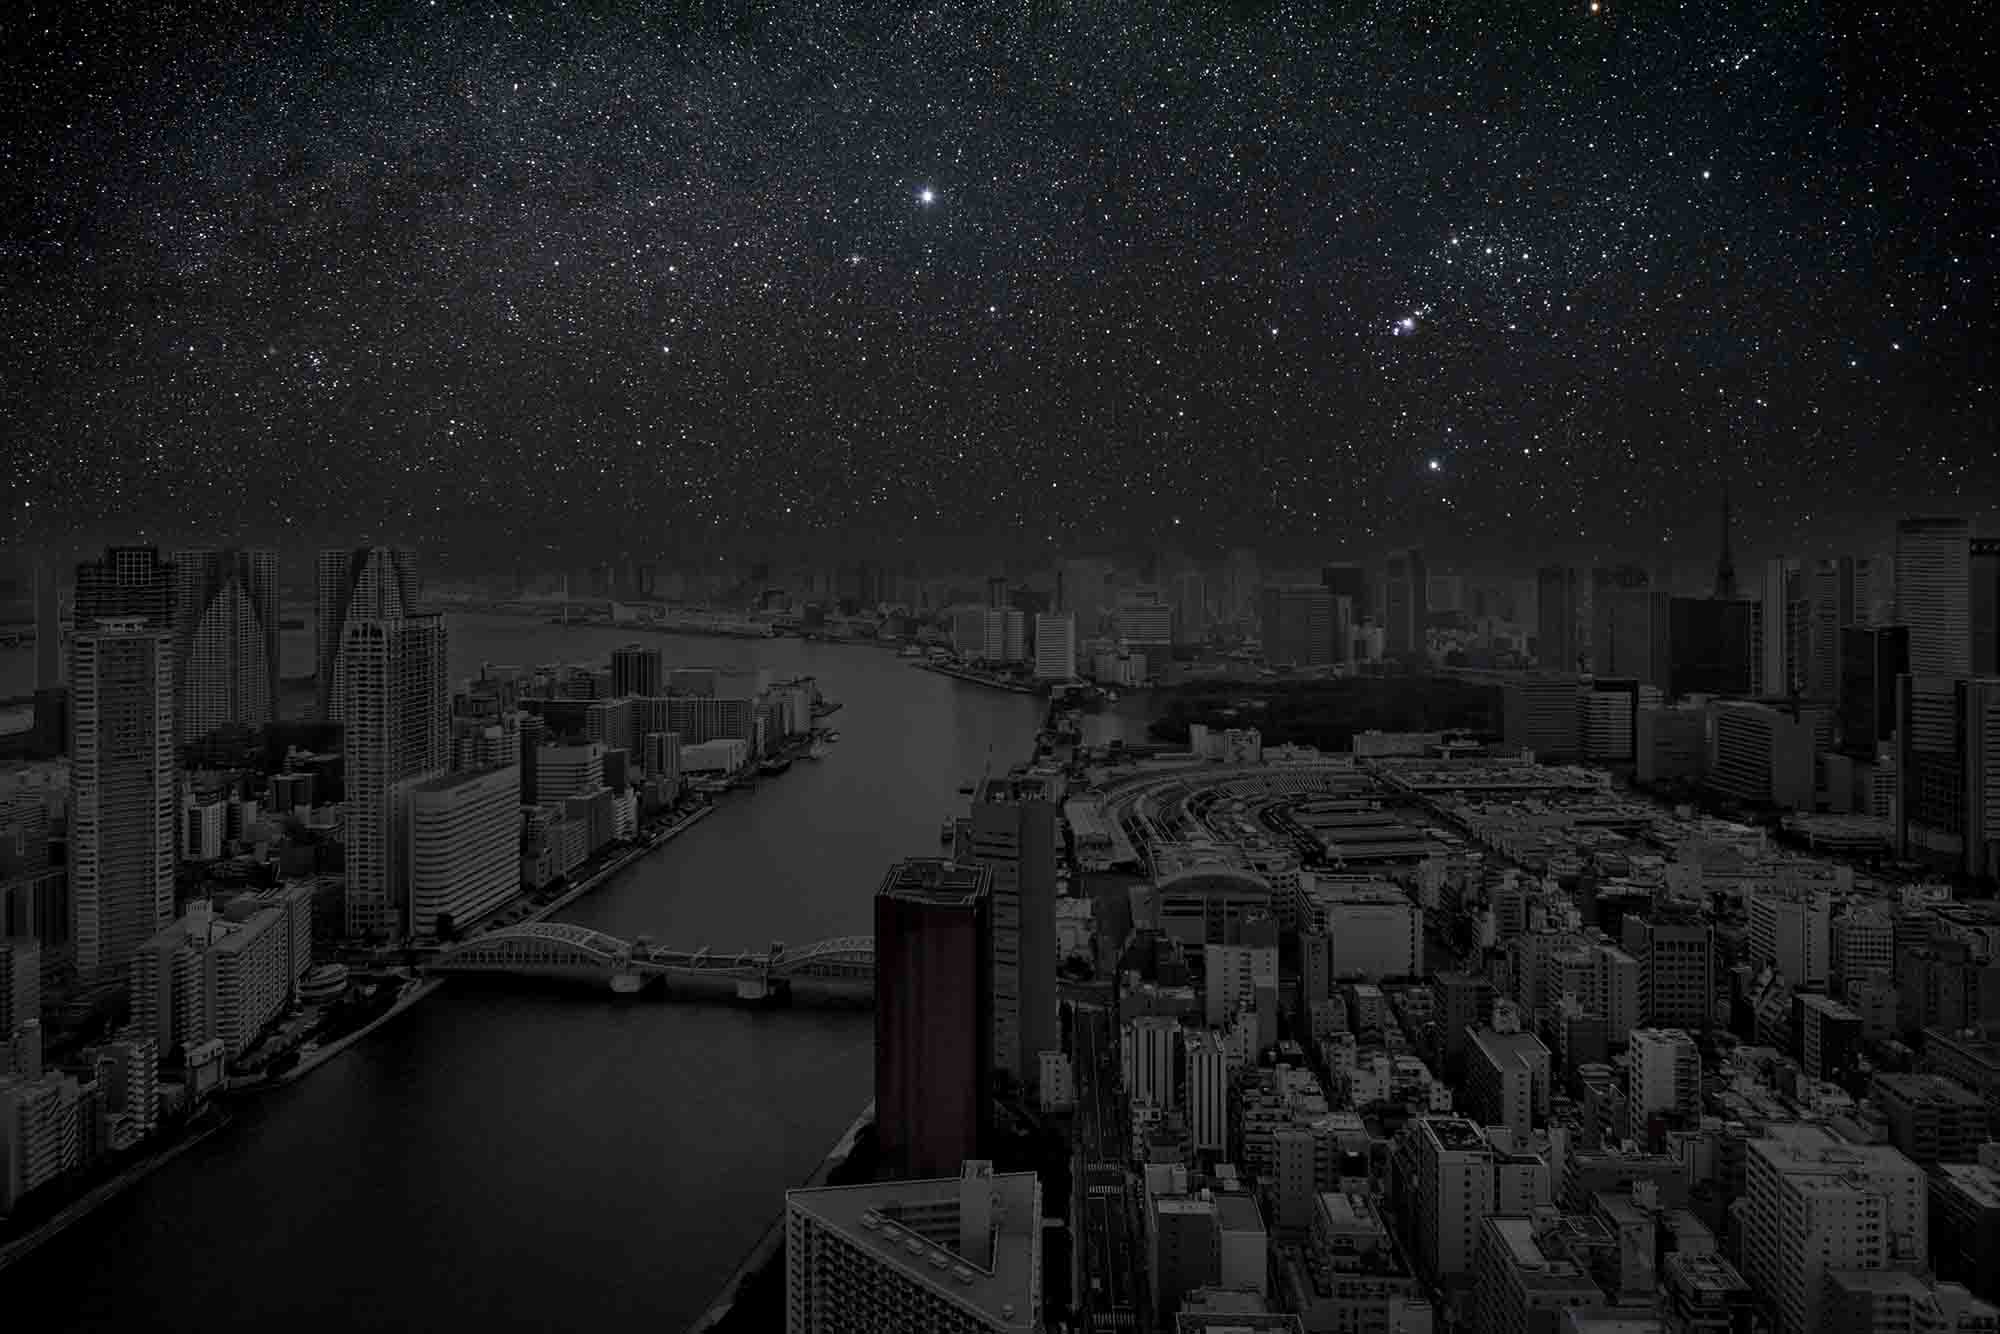 Tokyo 35° 40' 02'' N 2012-03-23 lst 10:00<br/>Darkened Cities - Villes éteintes